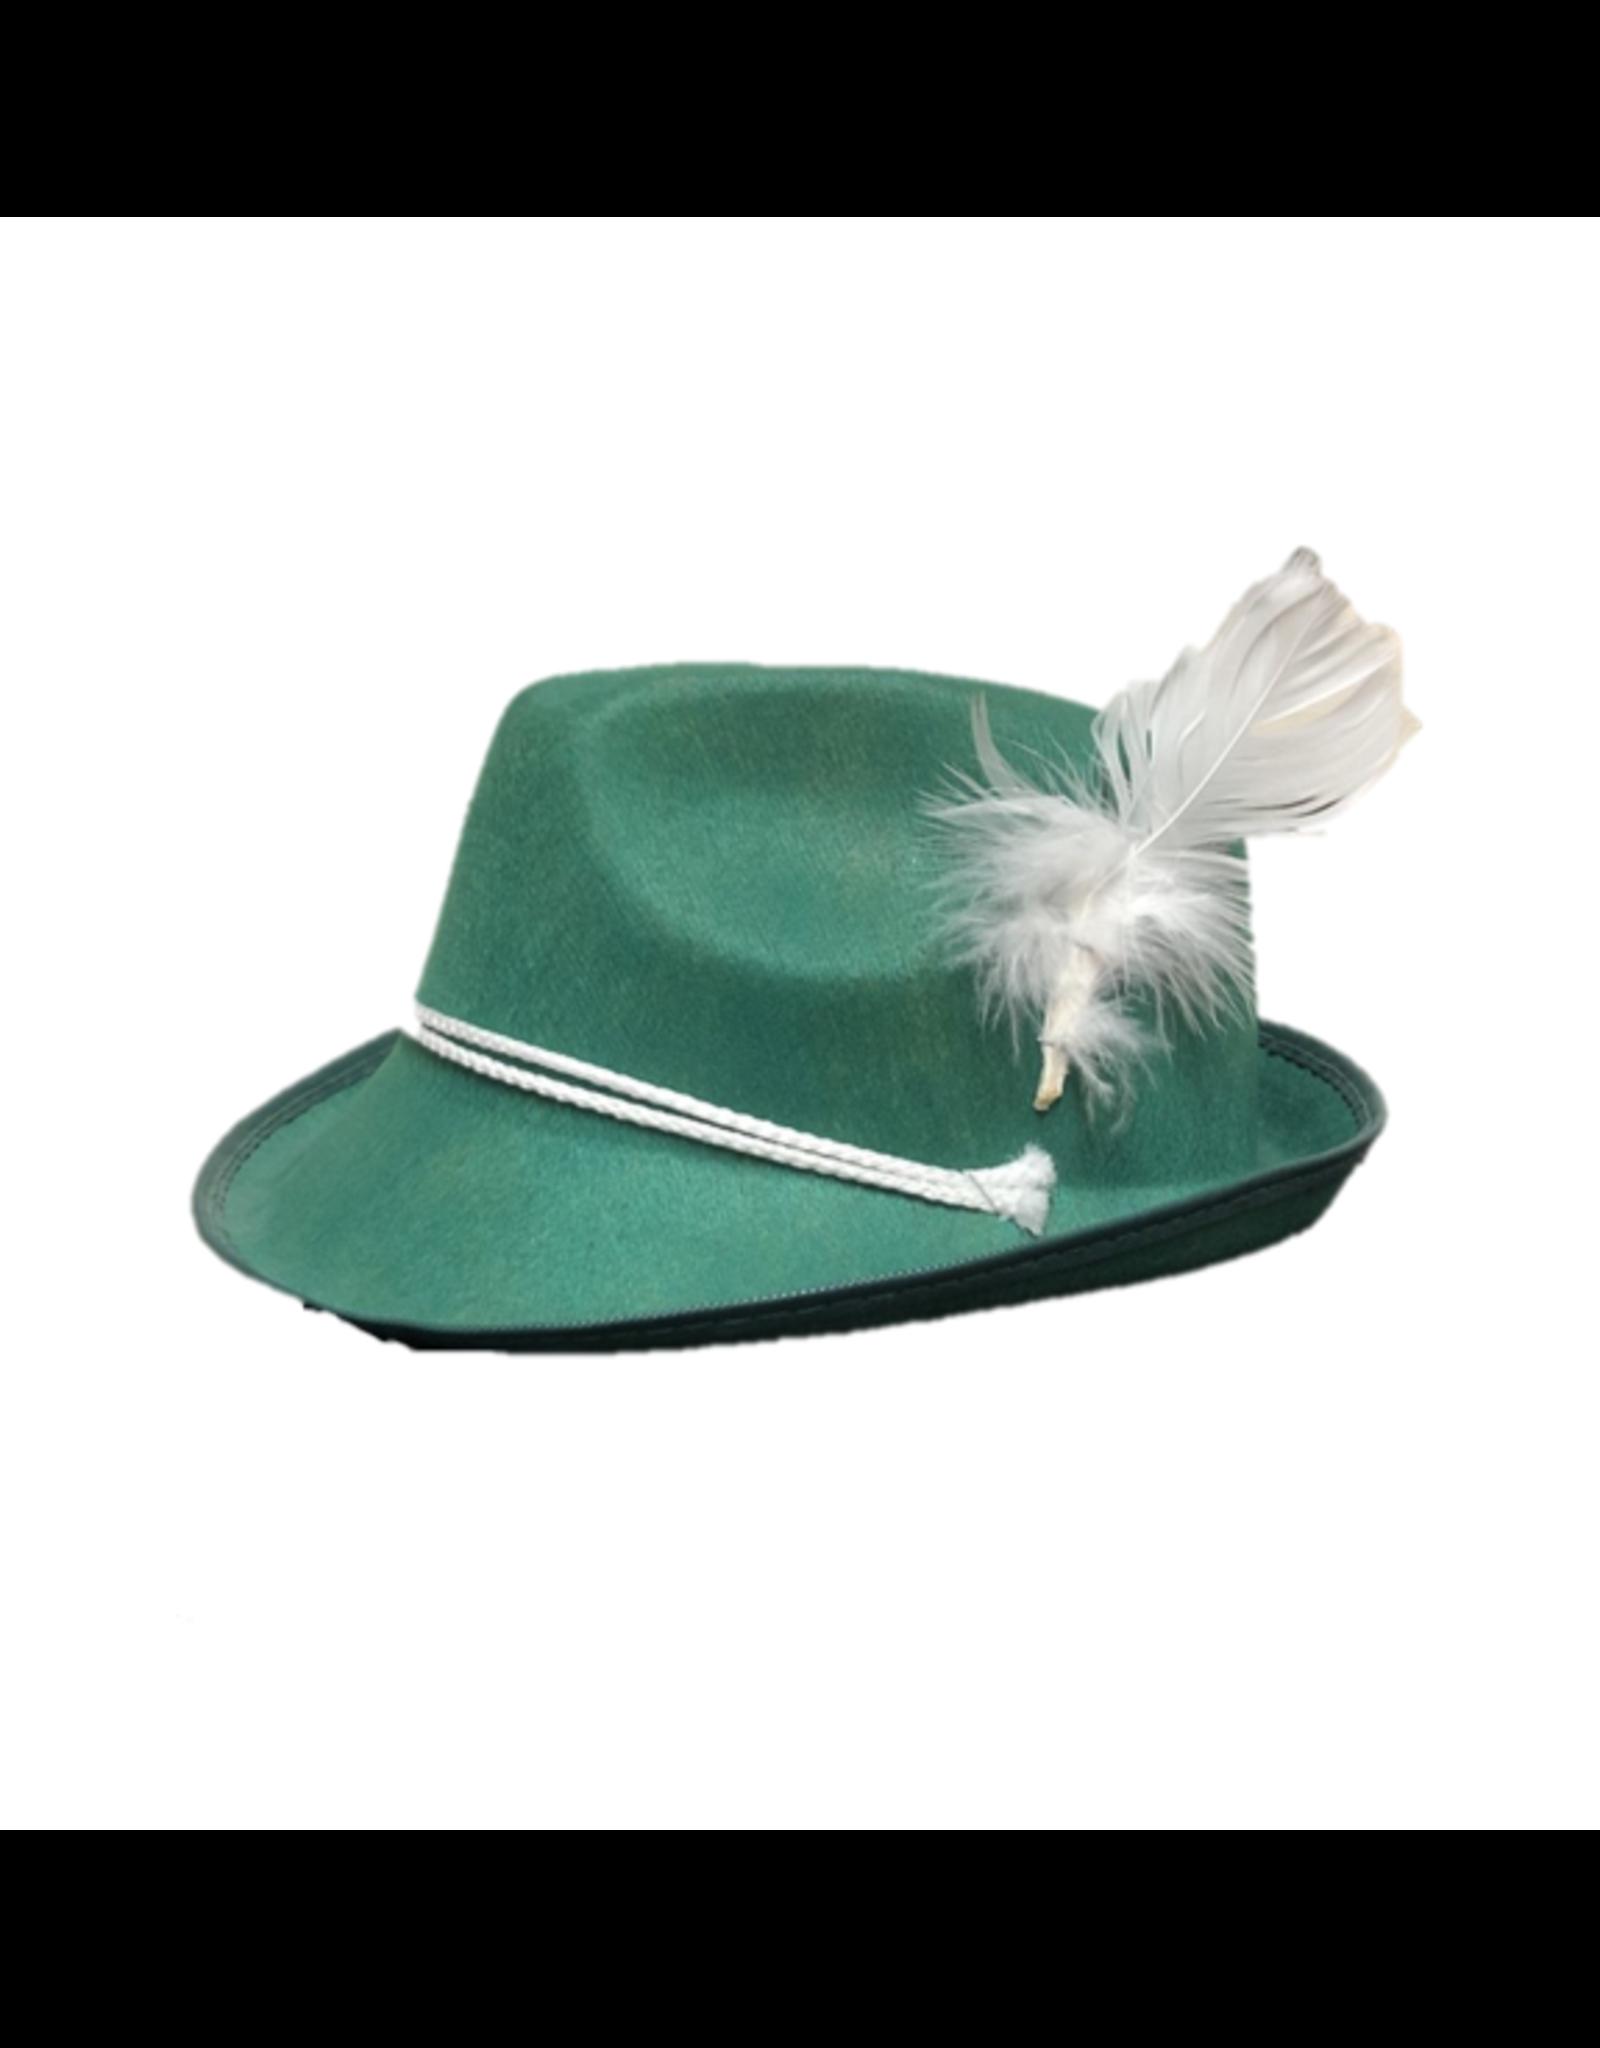 Karries Kostumes Green Alpine Hat